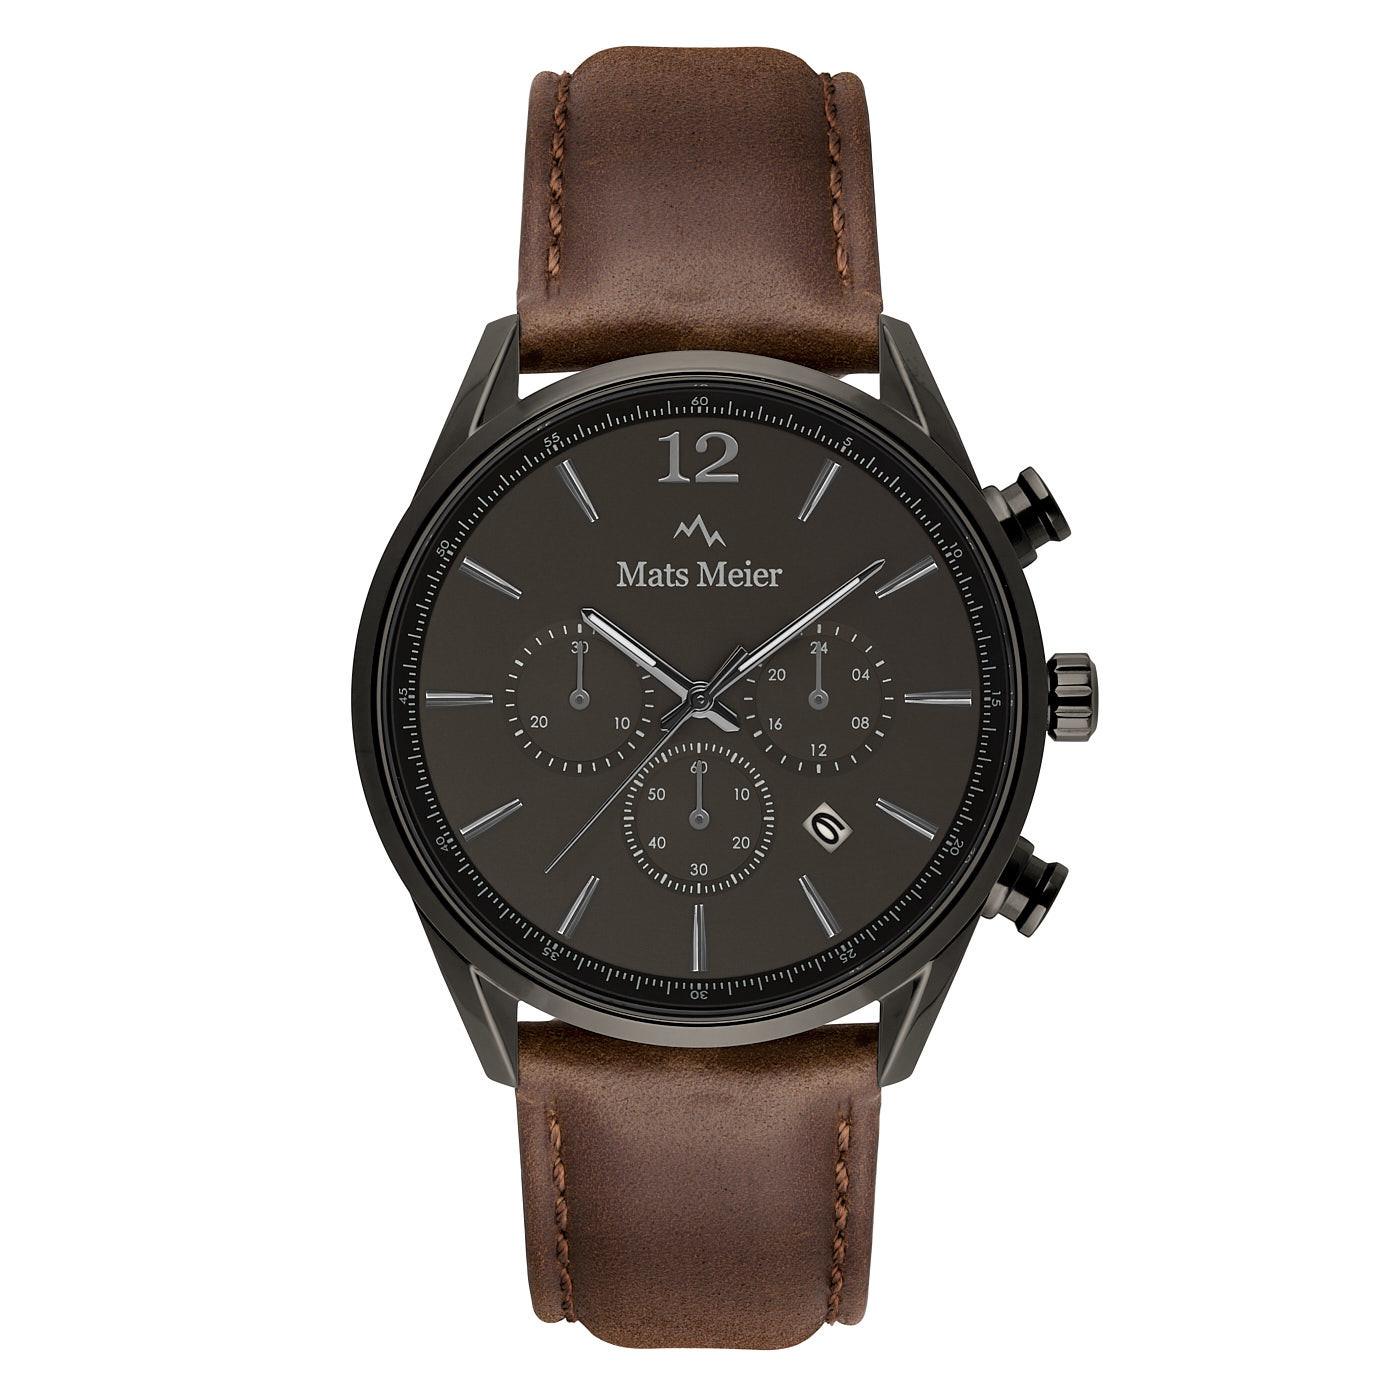 Mats Meier Grand Cornier montre chronographe gunmetal / marron foncé